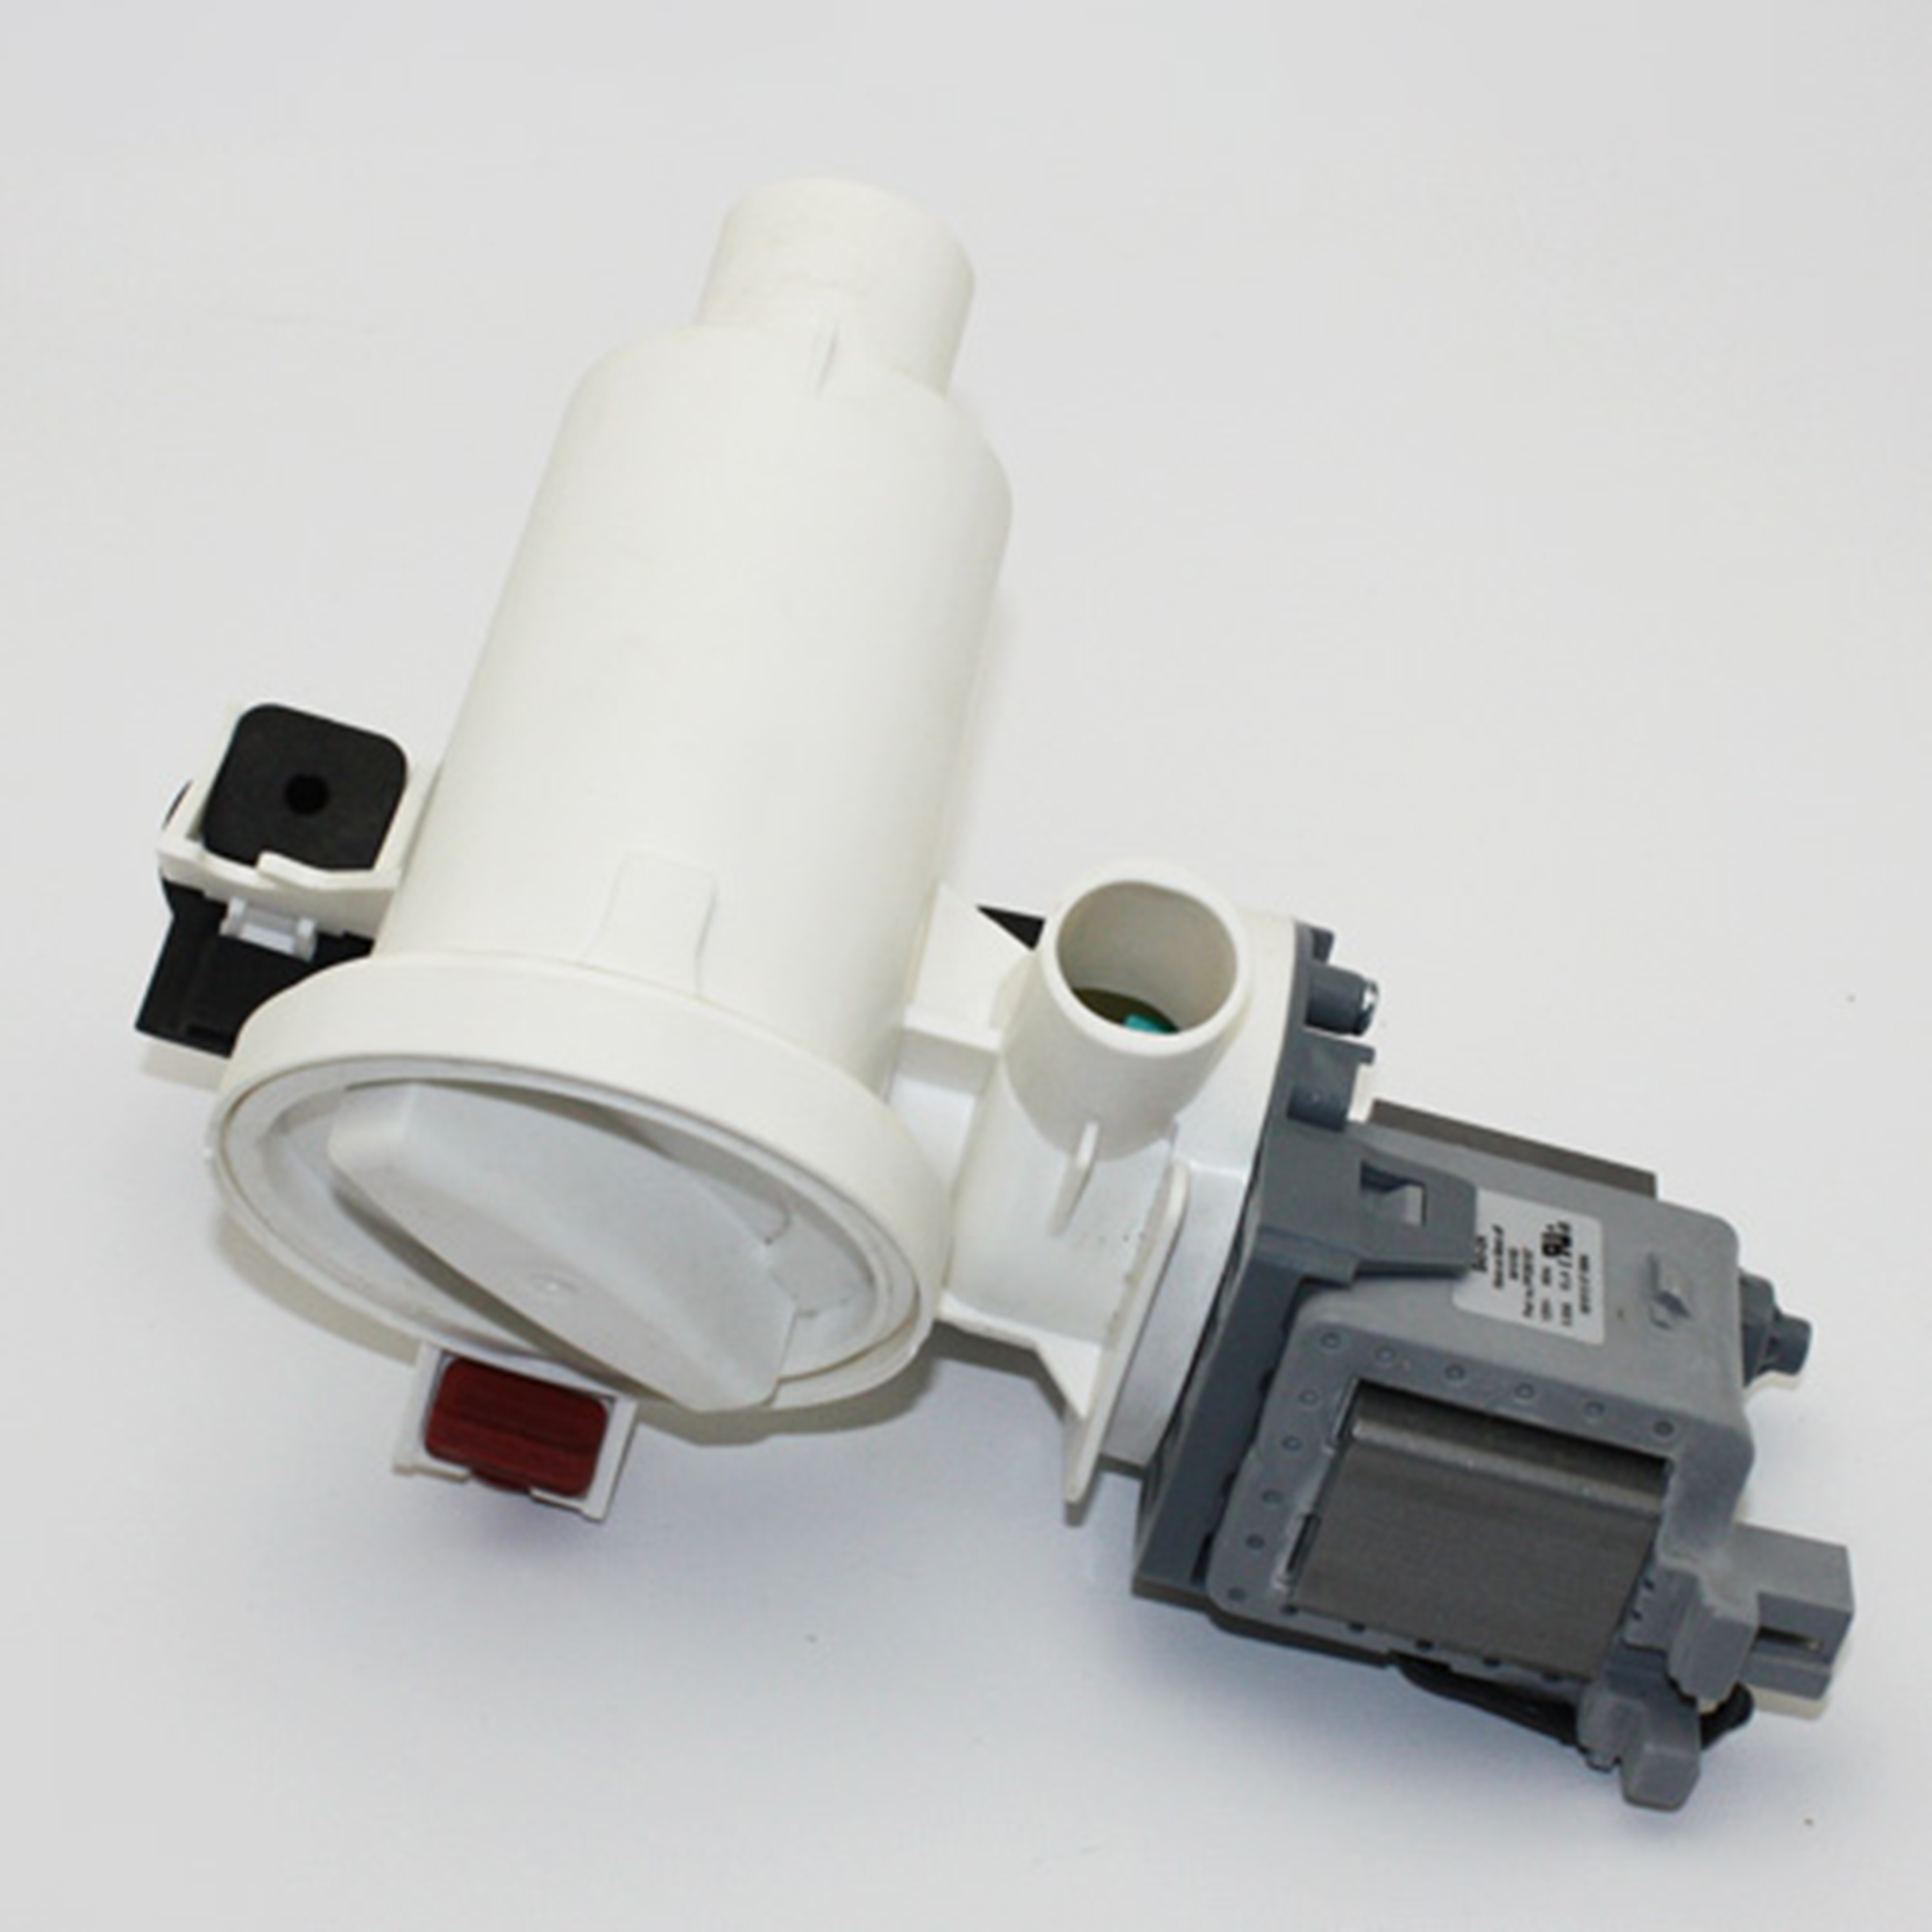 whirlpool duet washing machine replacement parts